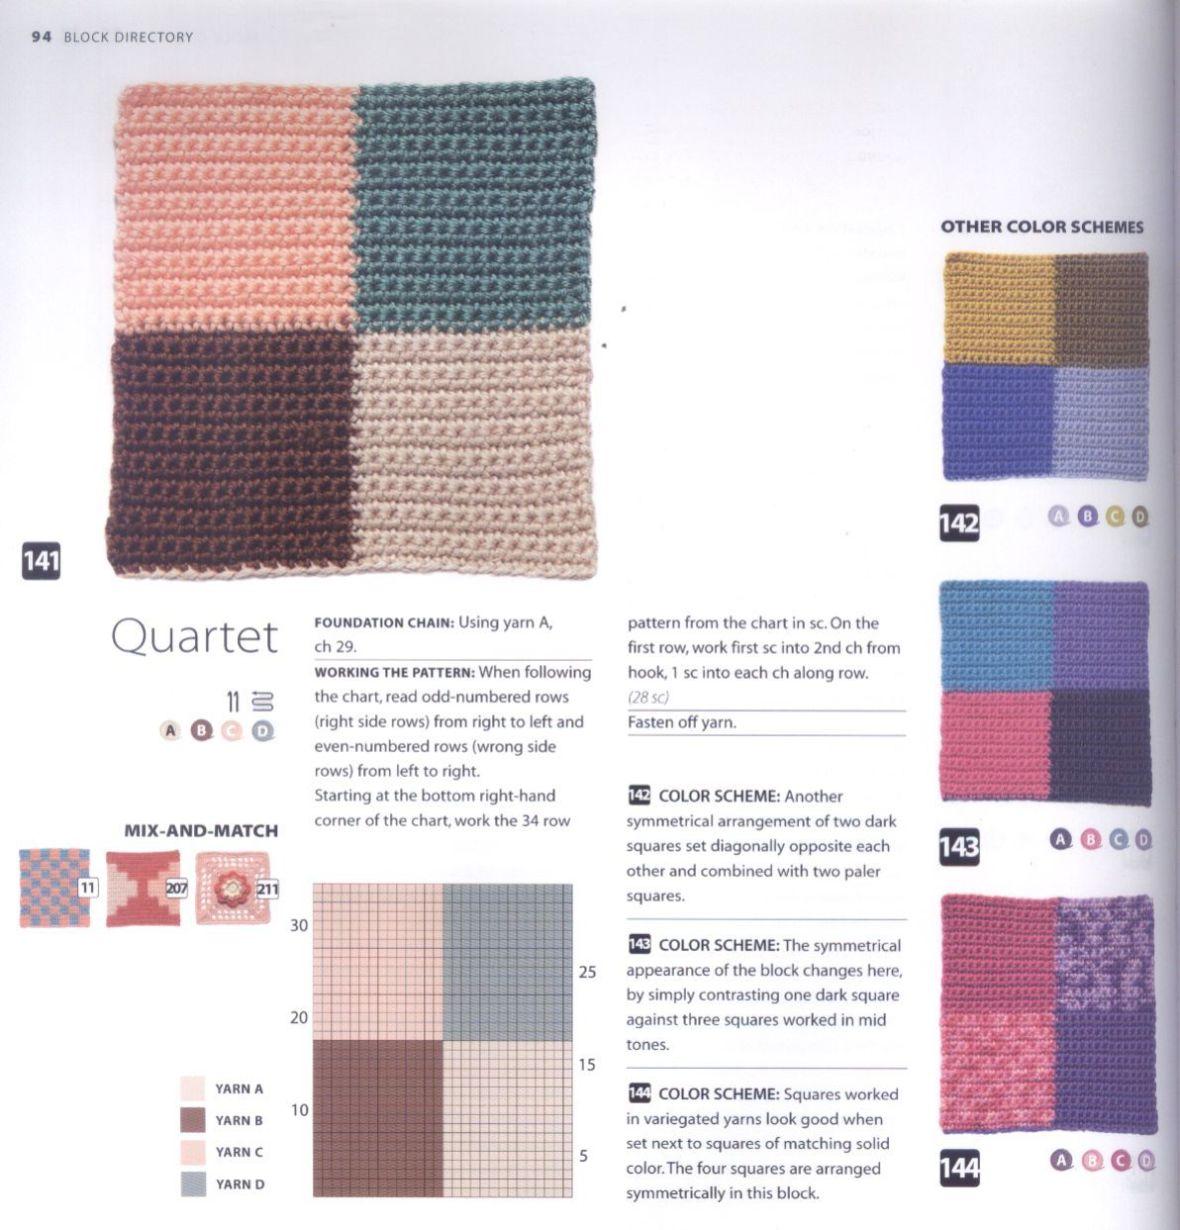 200 Crocheted Blocks for blankets, throws & Afghans 094